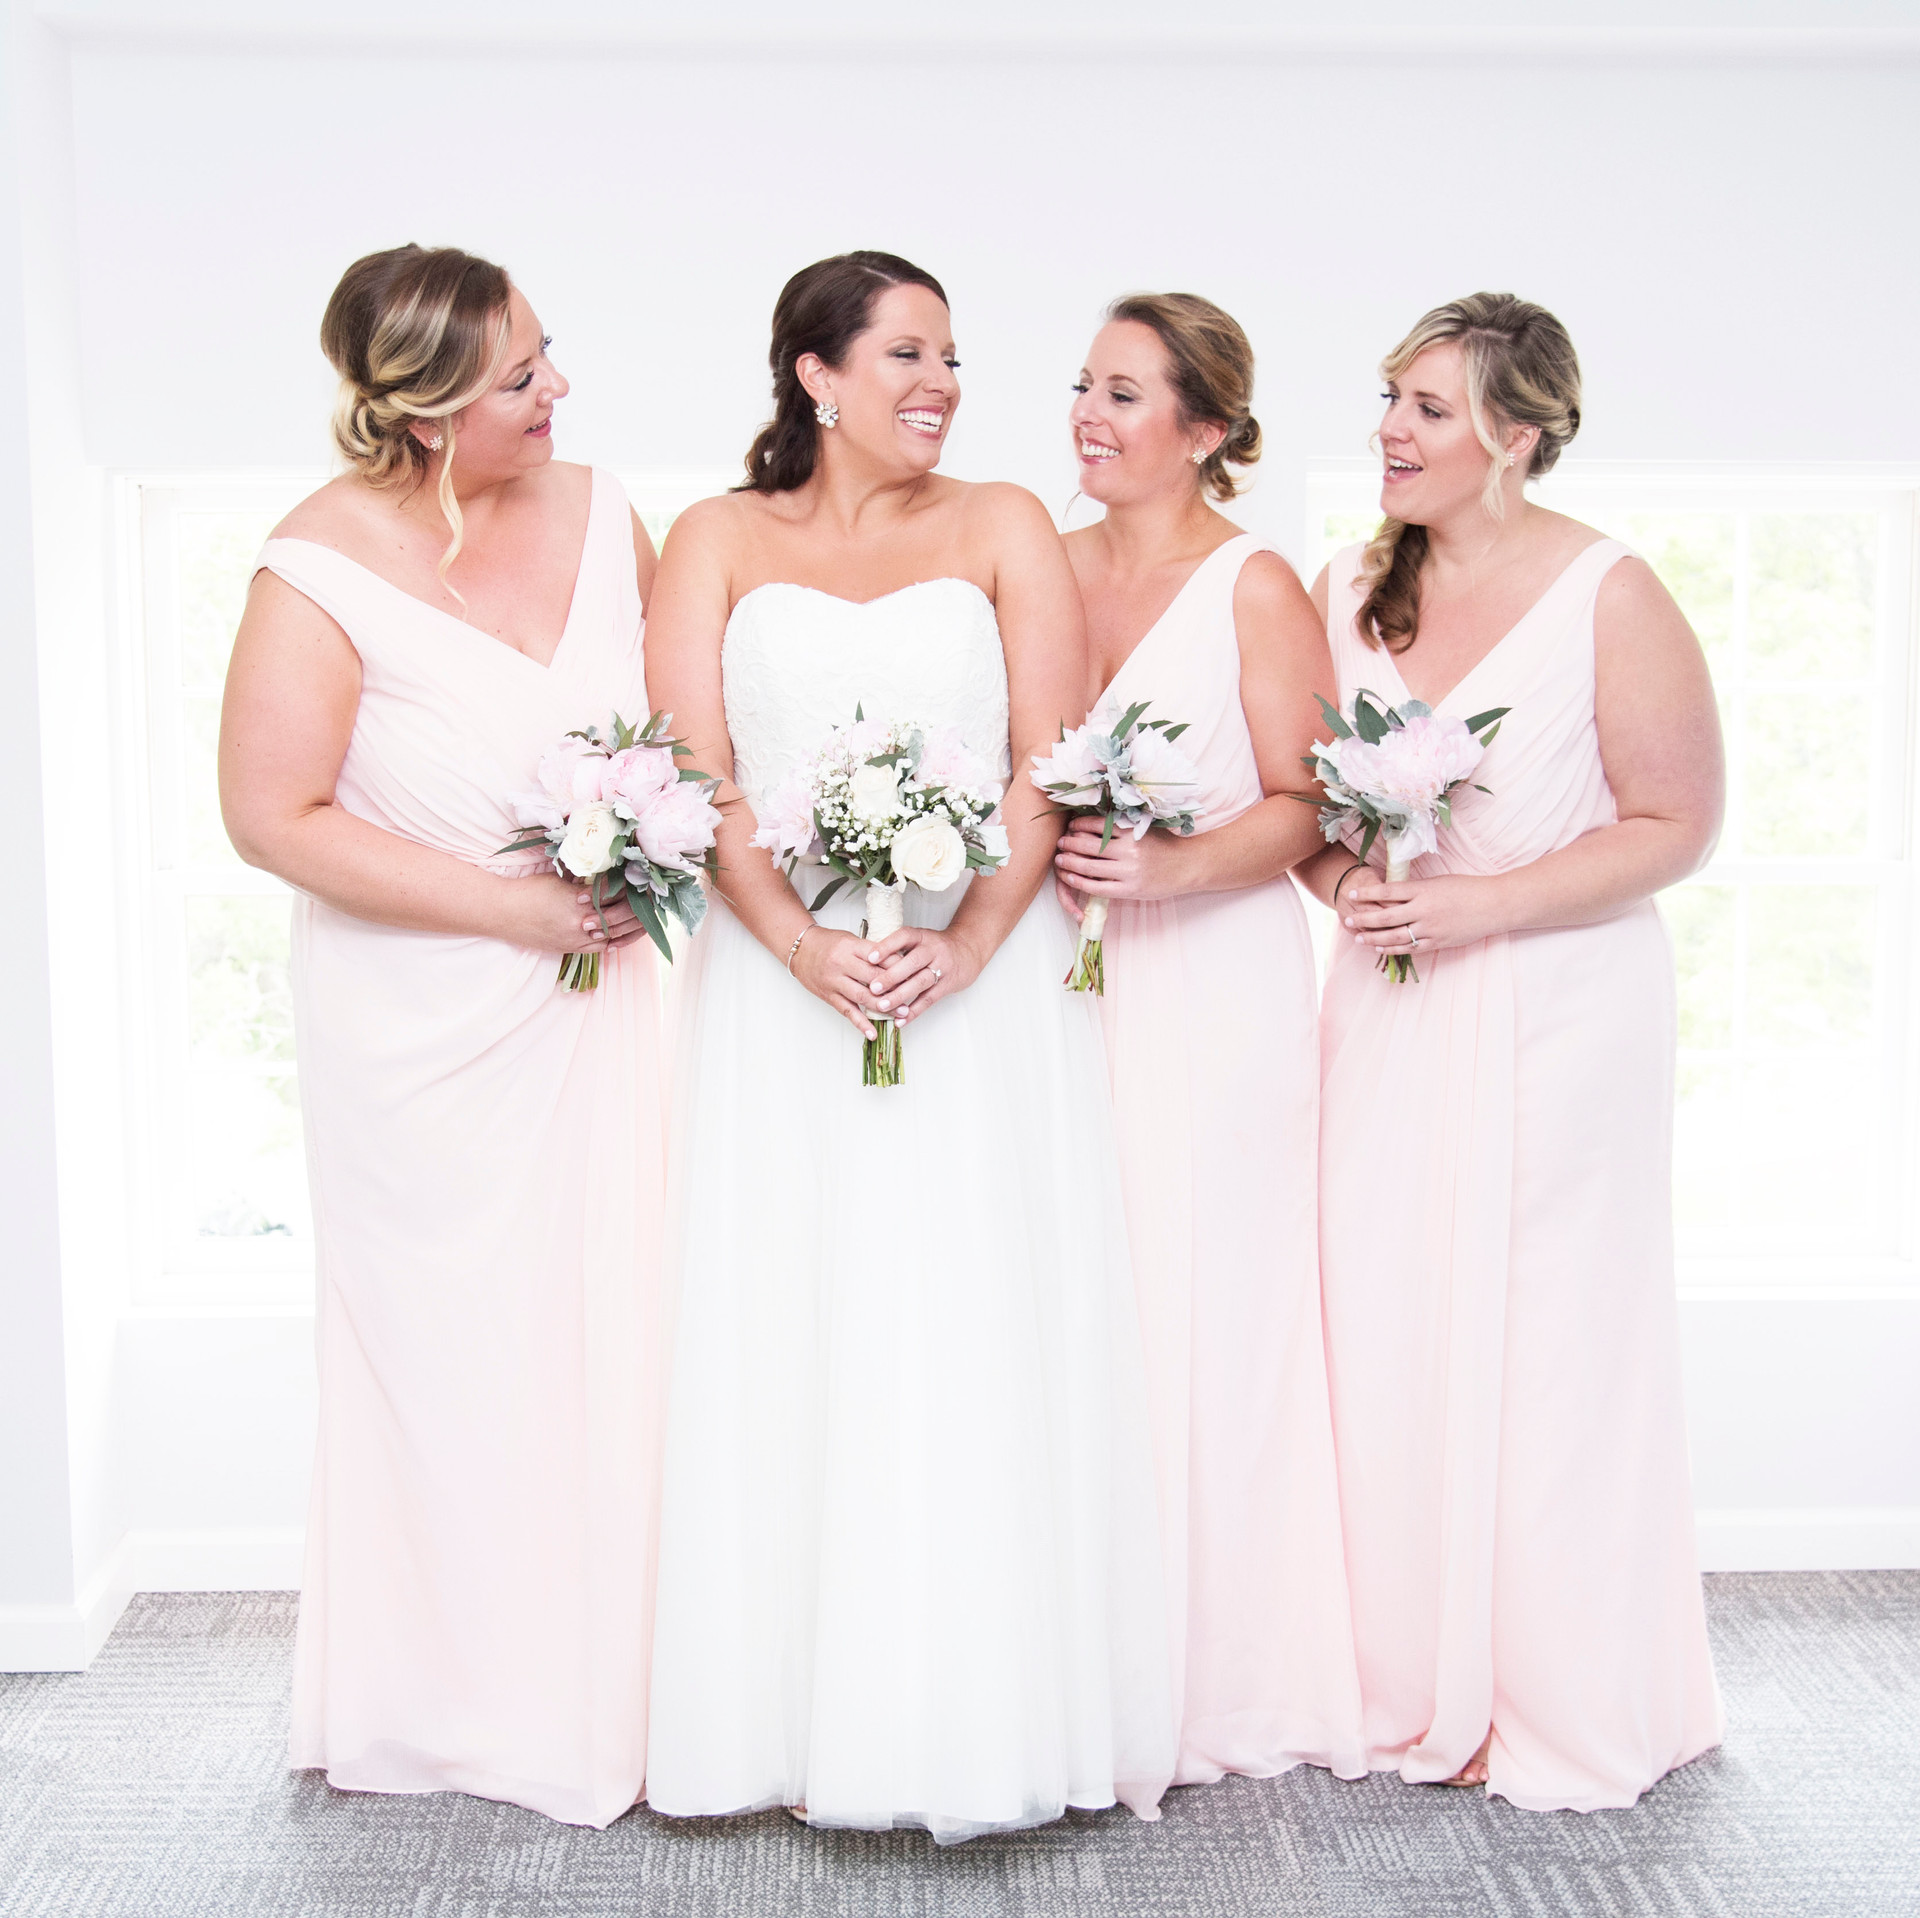 Best of Boston Wedding Photographers